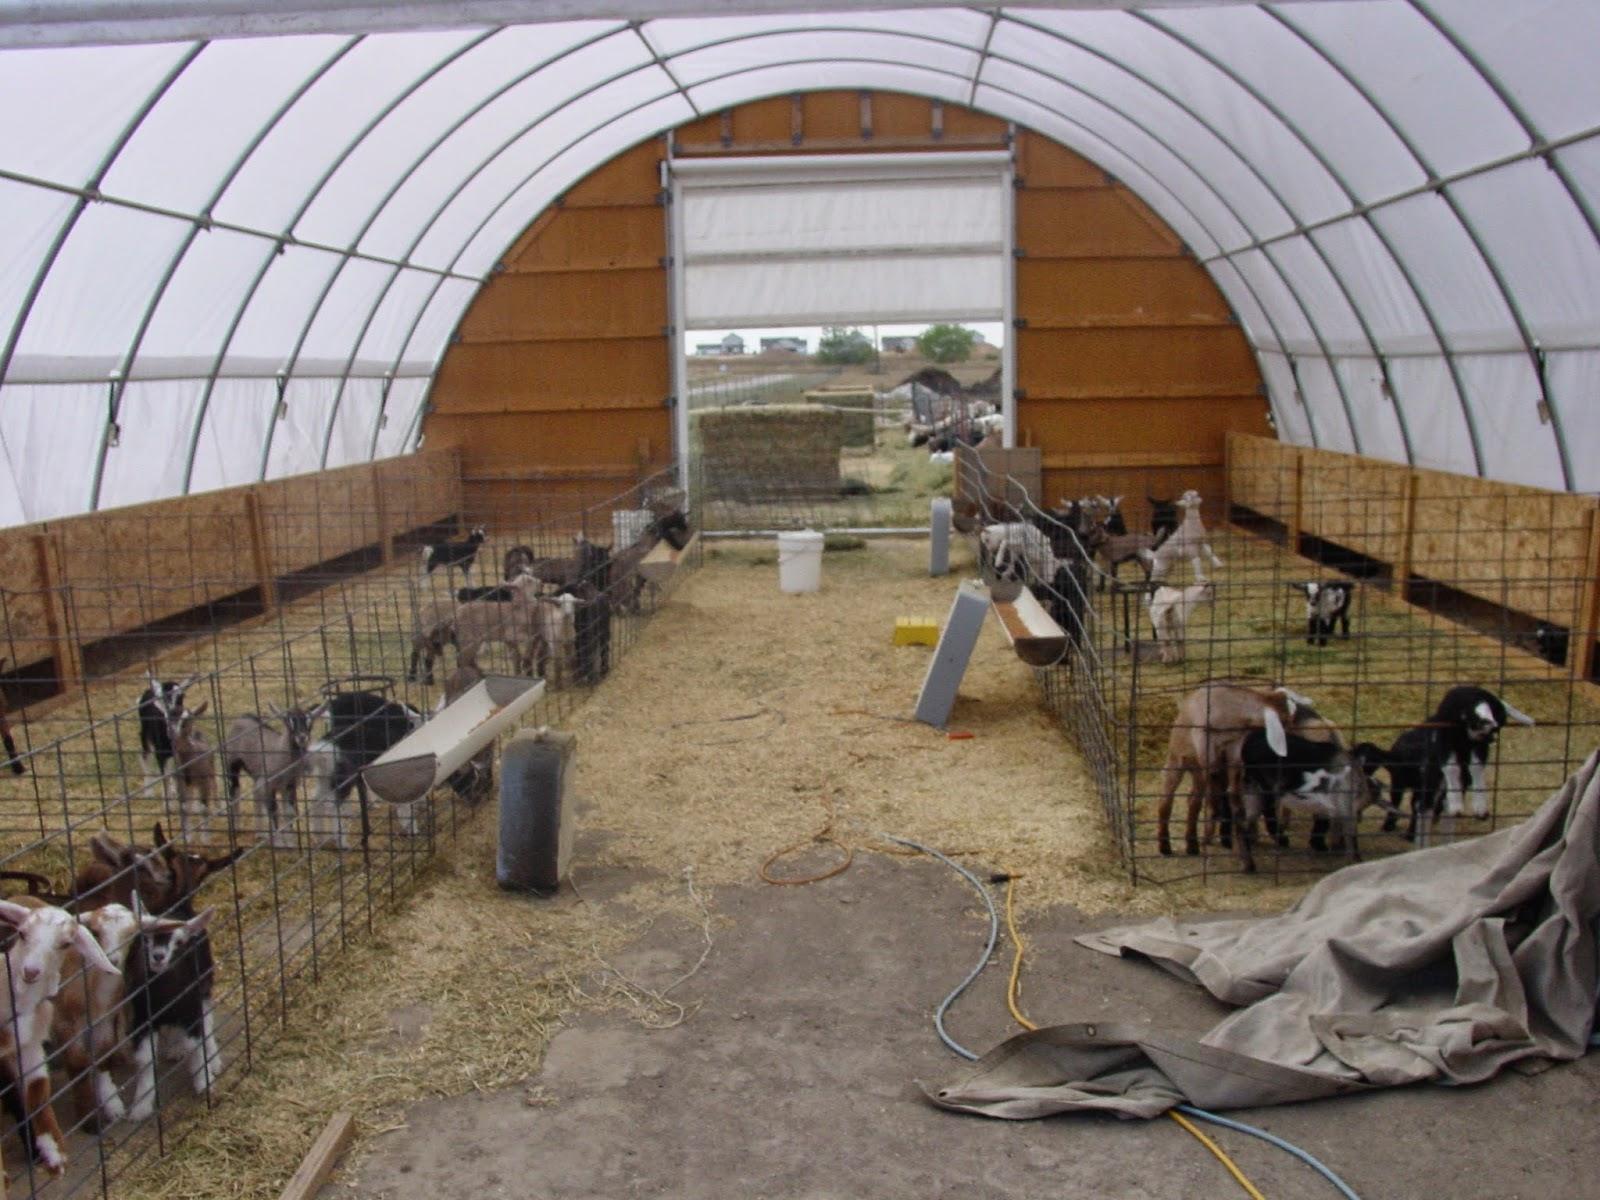 KinderR Communique Kinder Goats In A Commercial Dairy